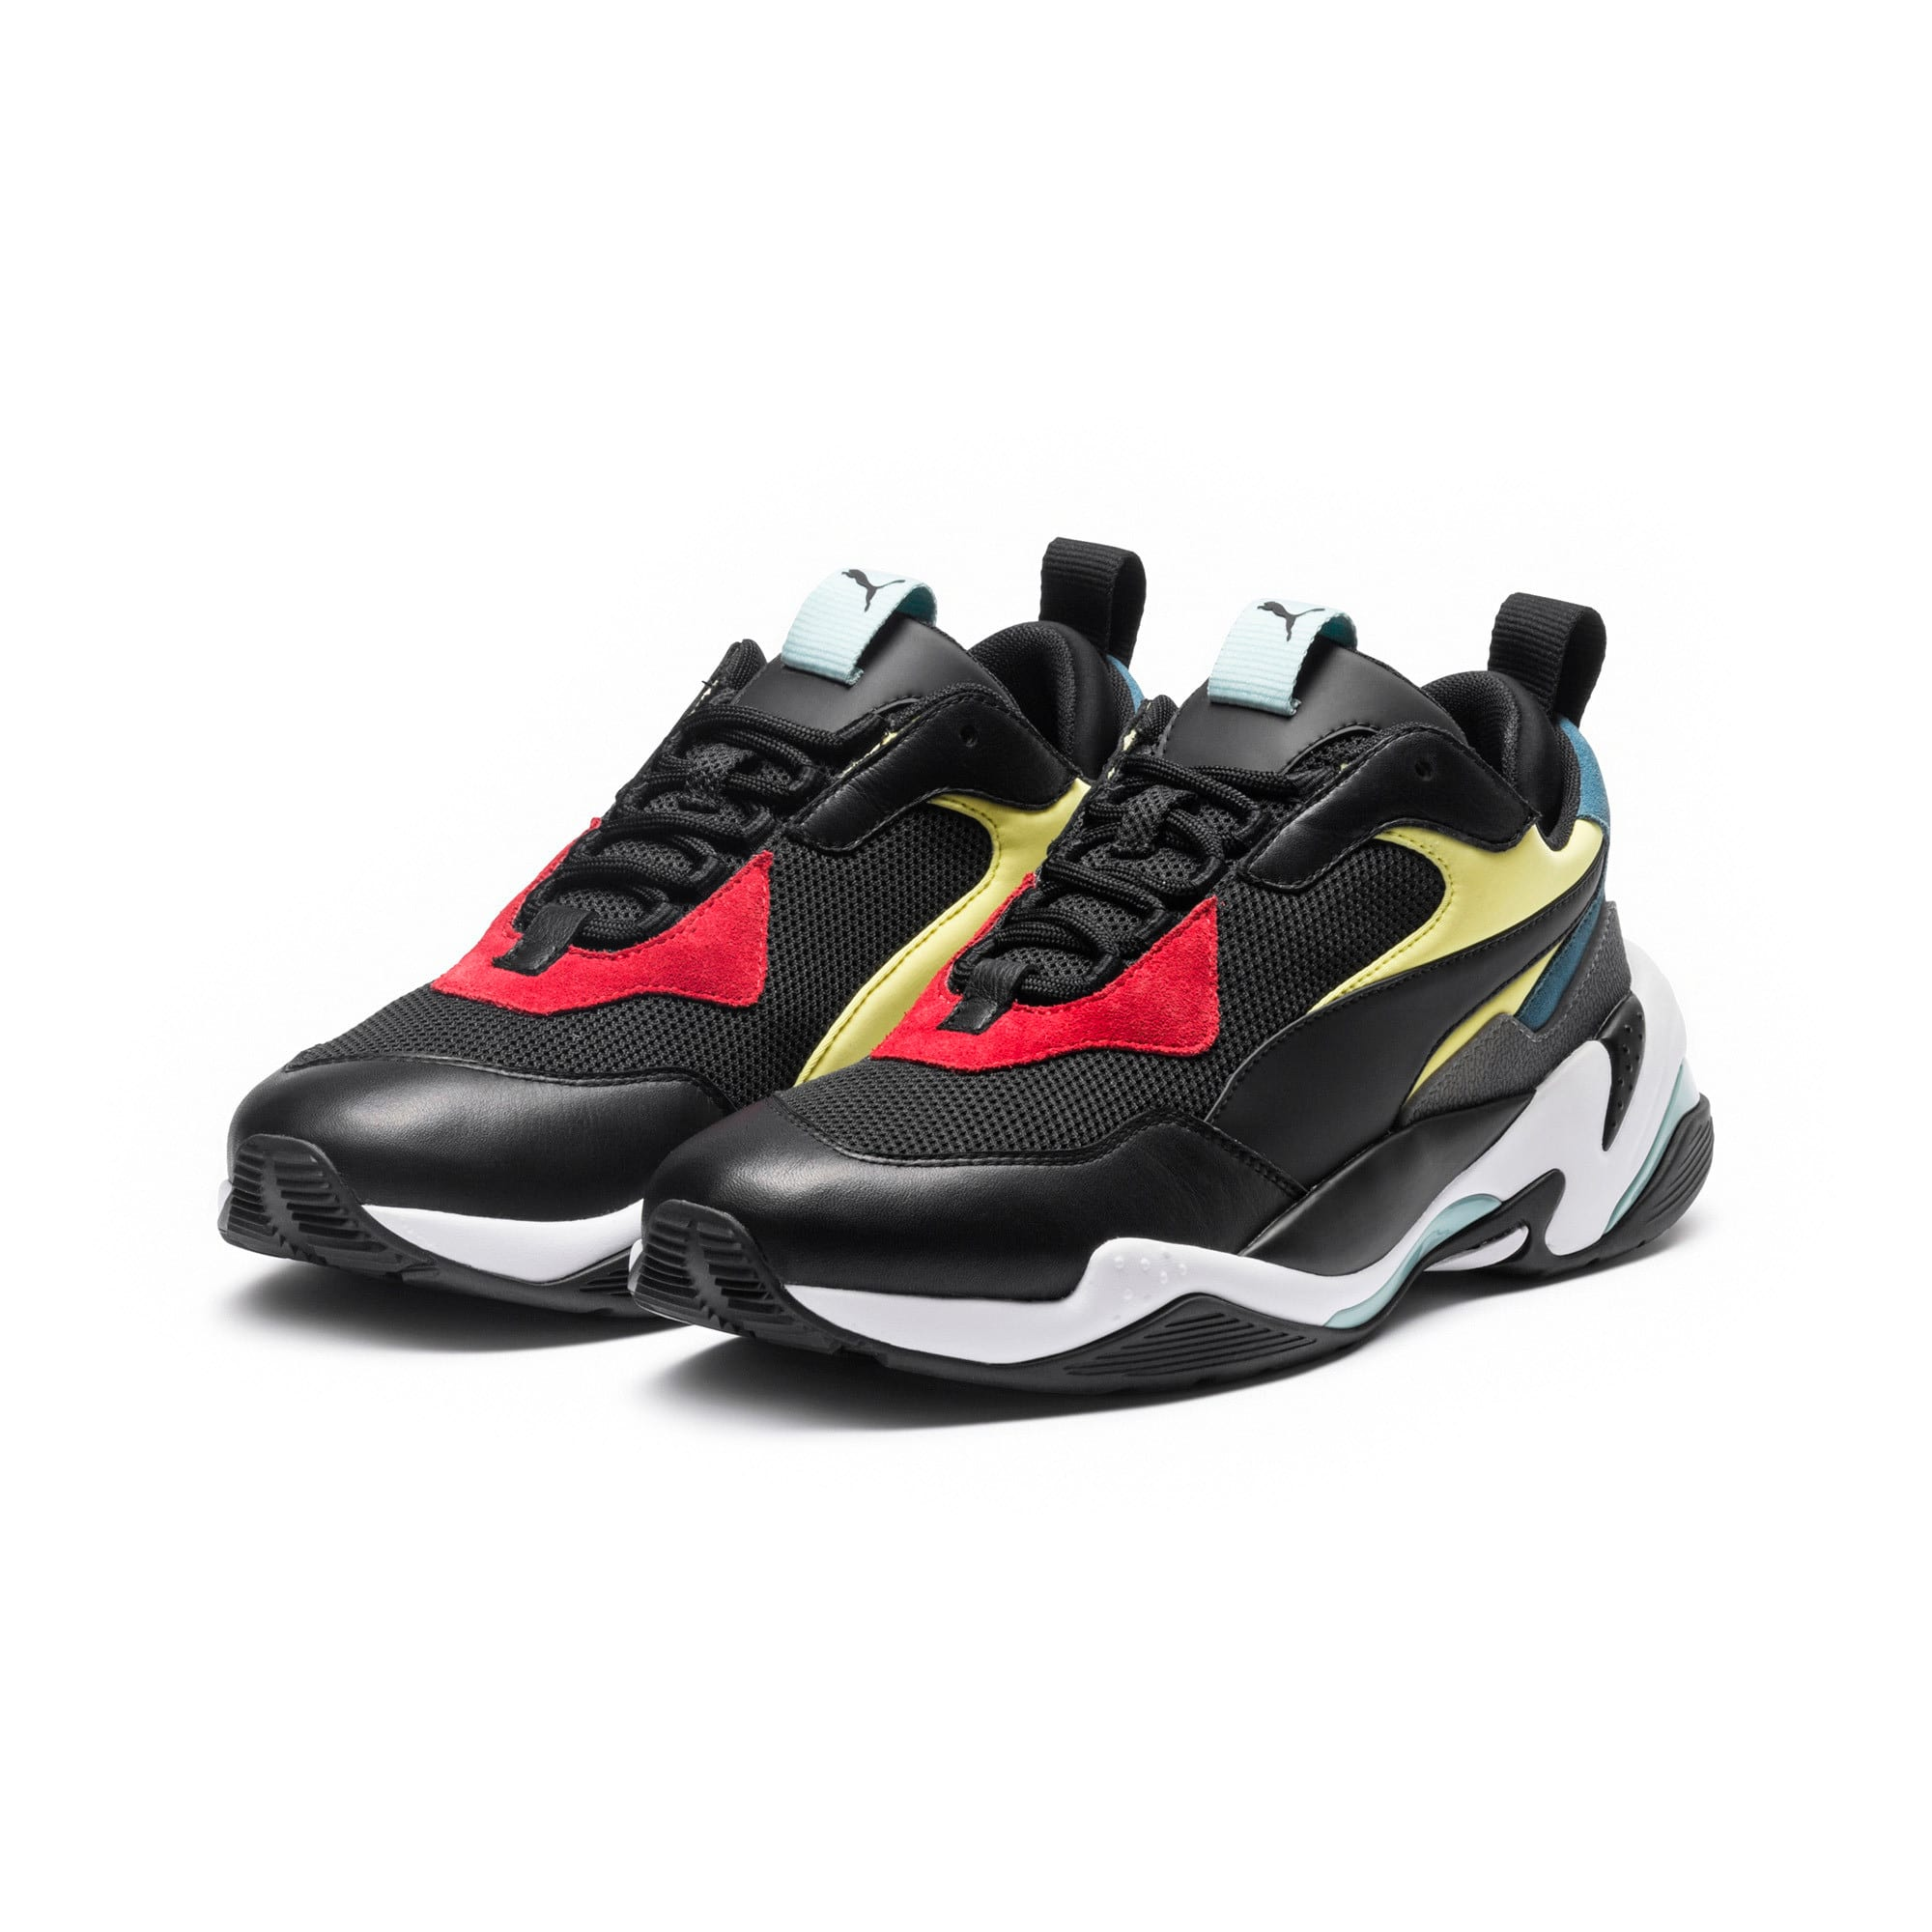 Thumbnail 2 of Sneakers Thunder Spectra, Puma Blk-Puma Blk-Puma White, medium